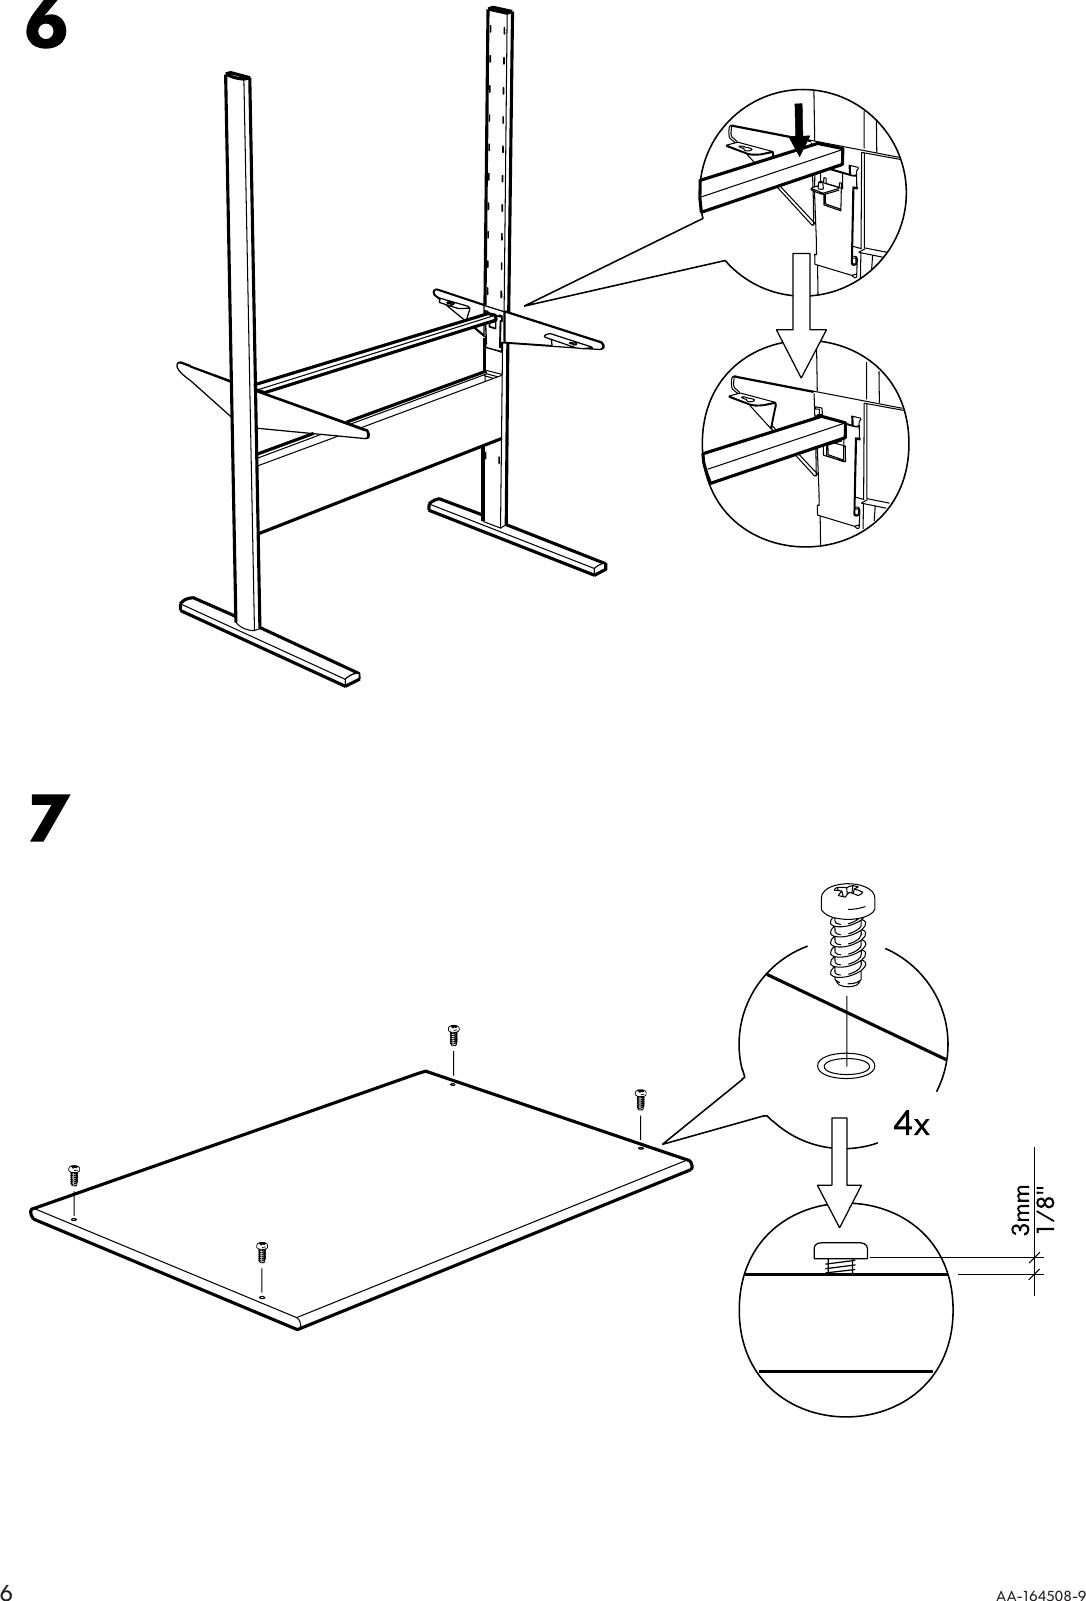 Ikea Fredrik Computer Workstation 39X24 Assembly Instruction